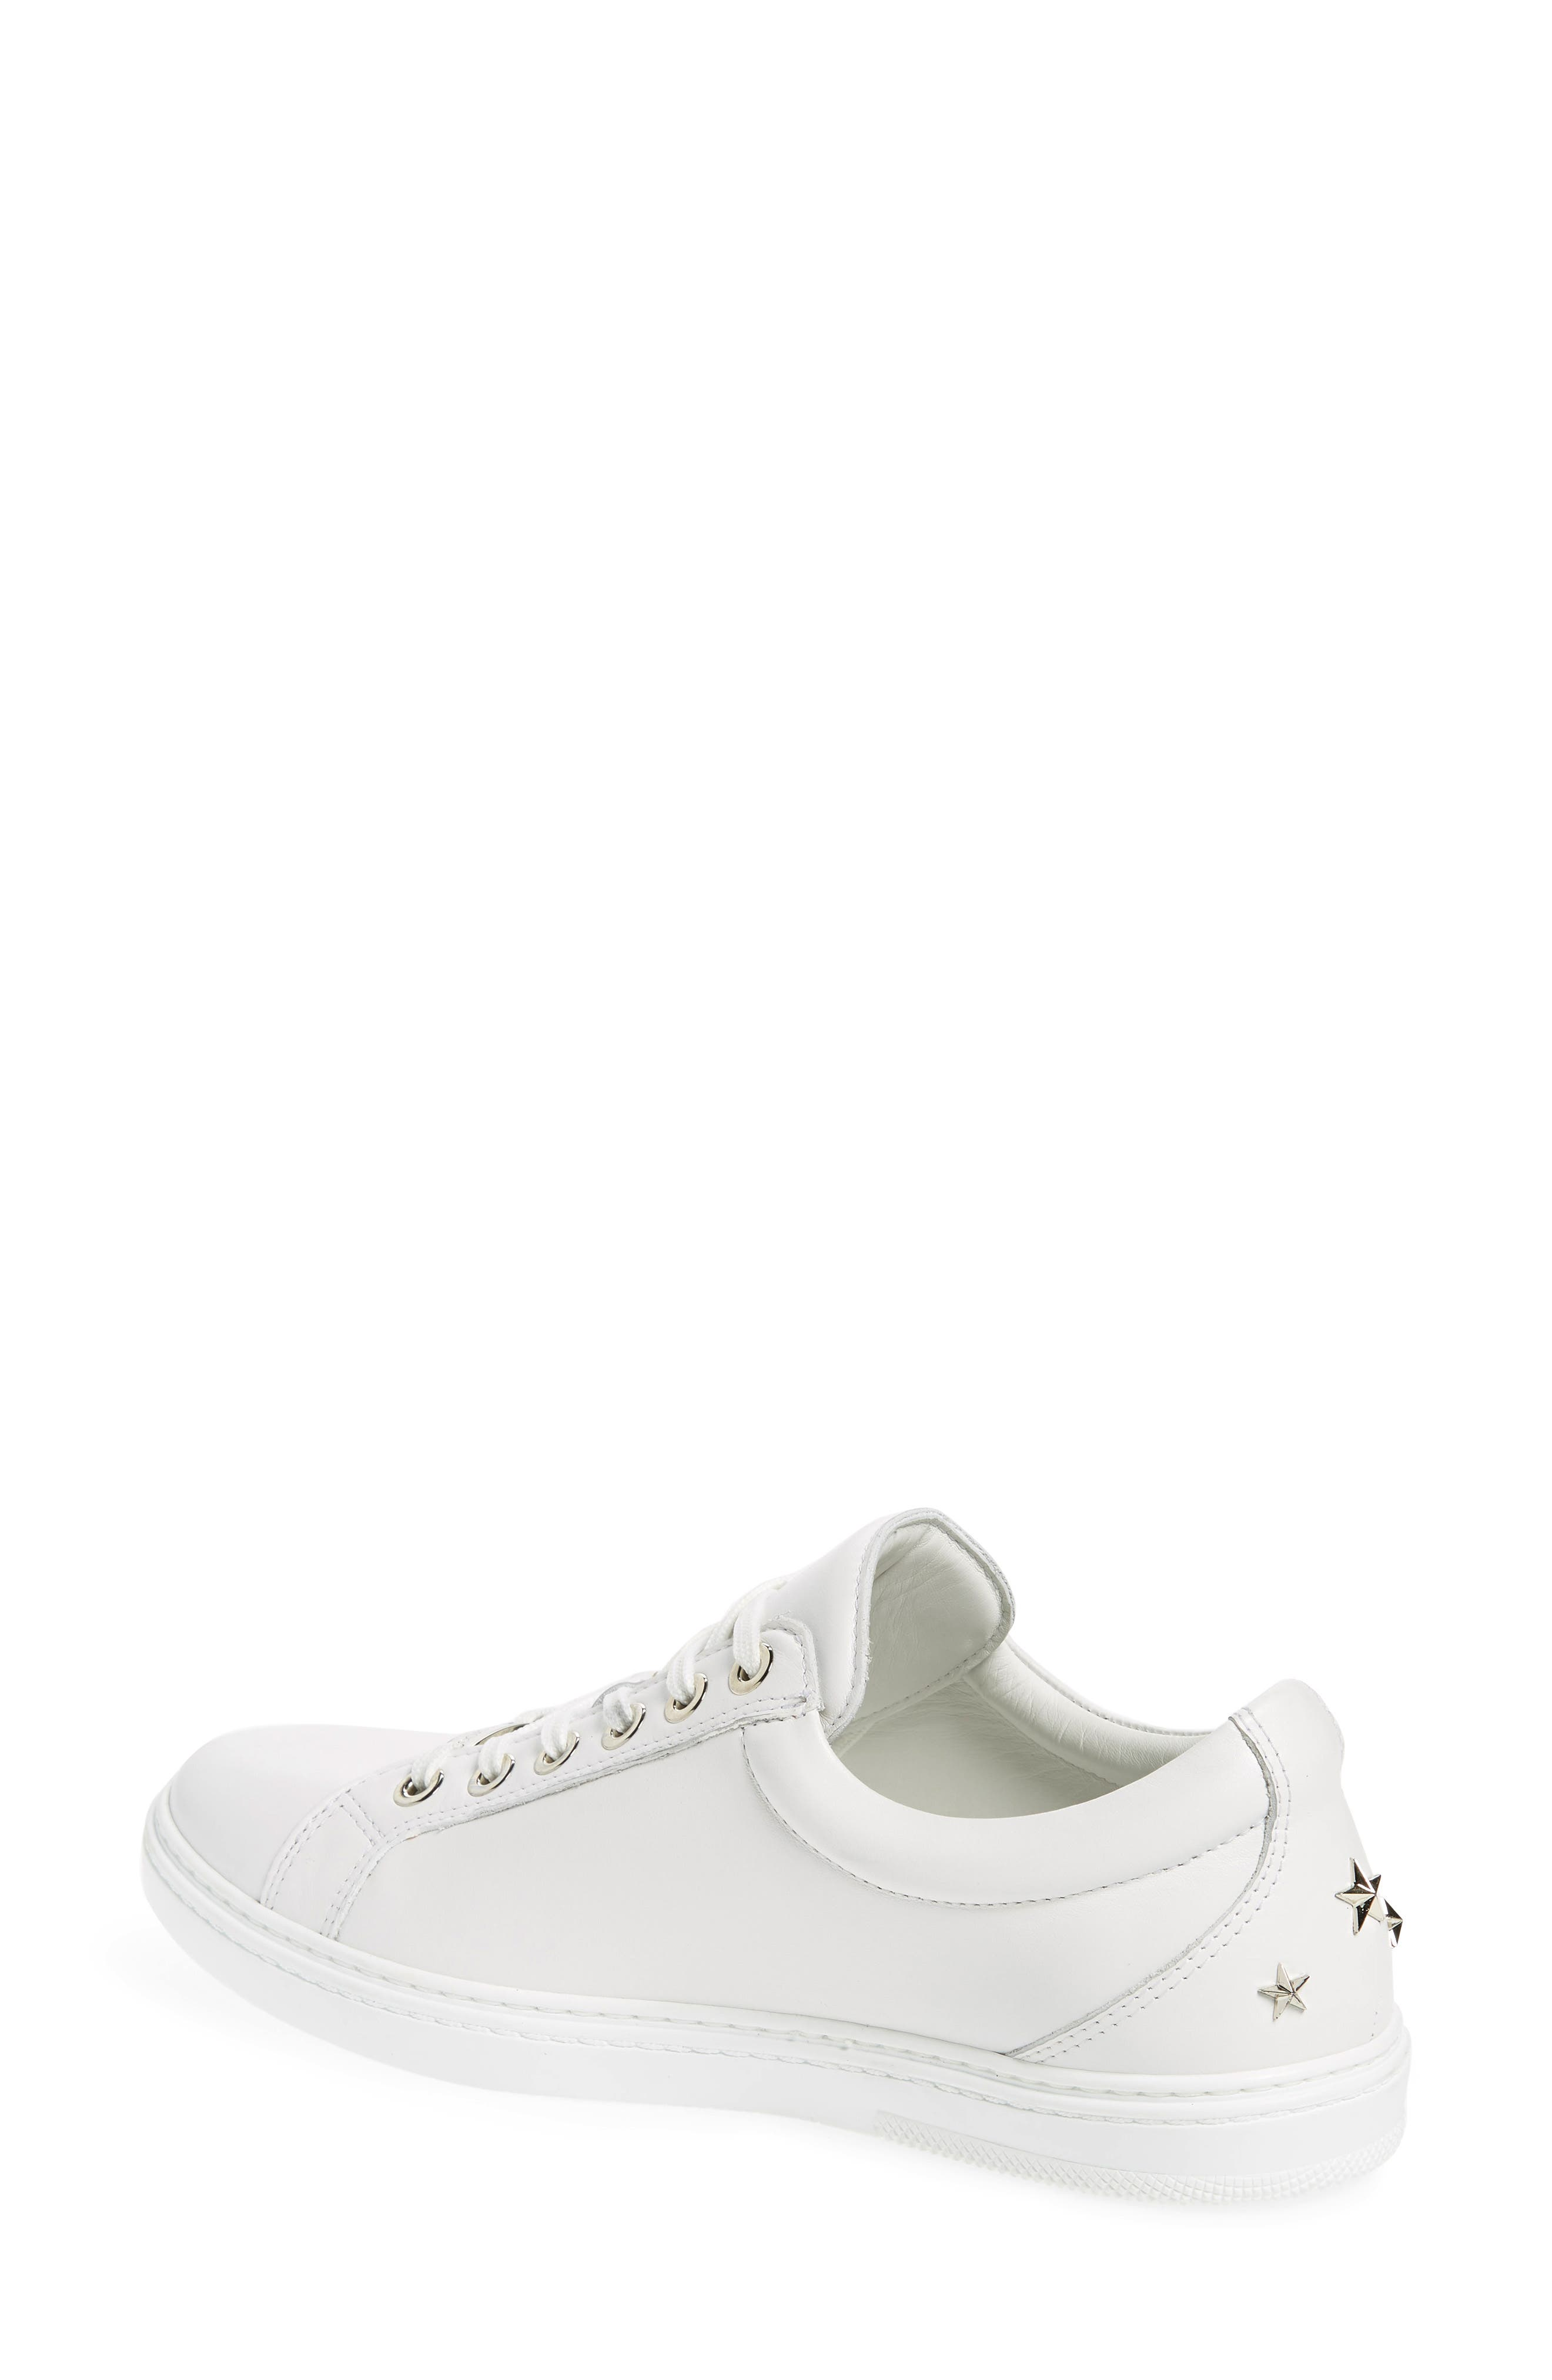 64d46075ed7 Men s Jimmy Choo Designer Shoes